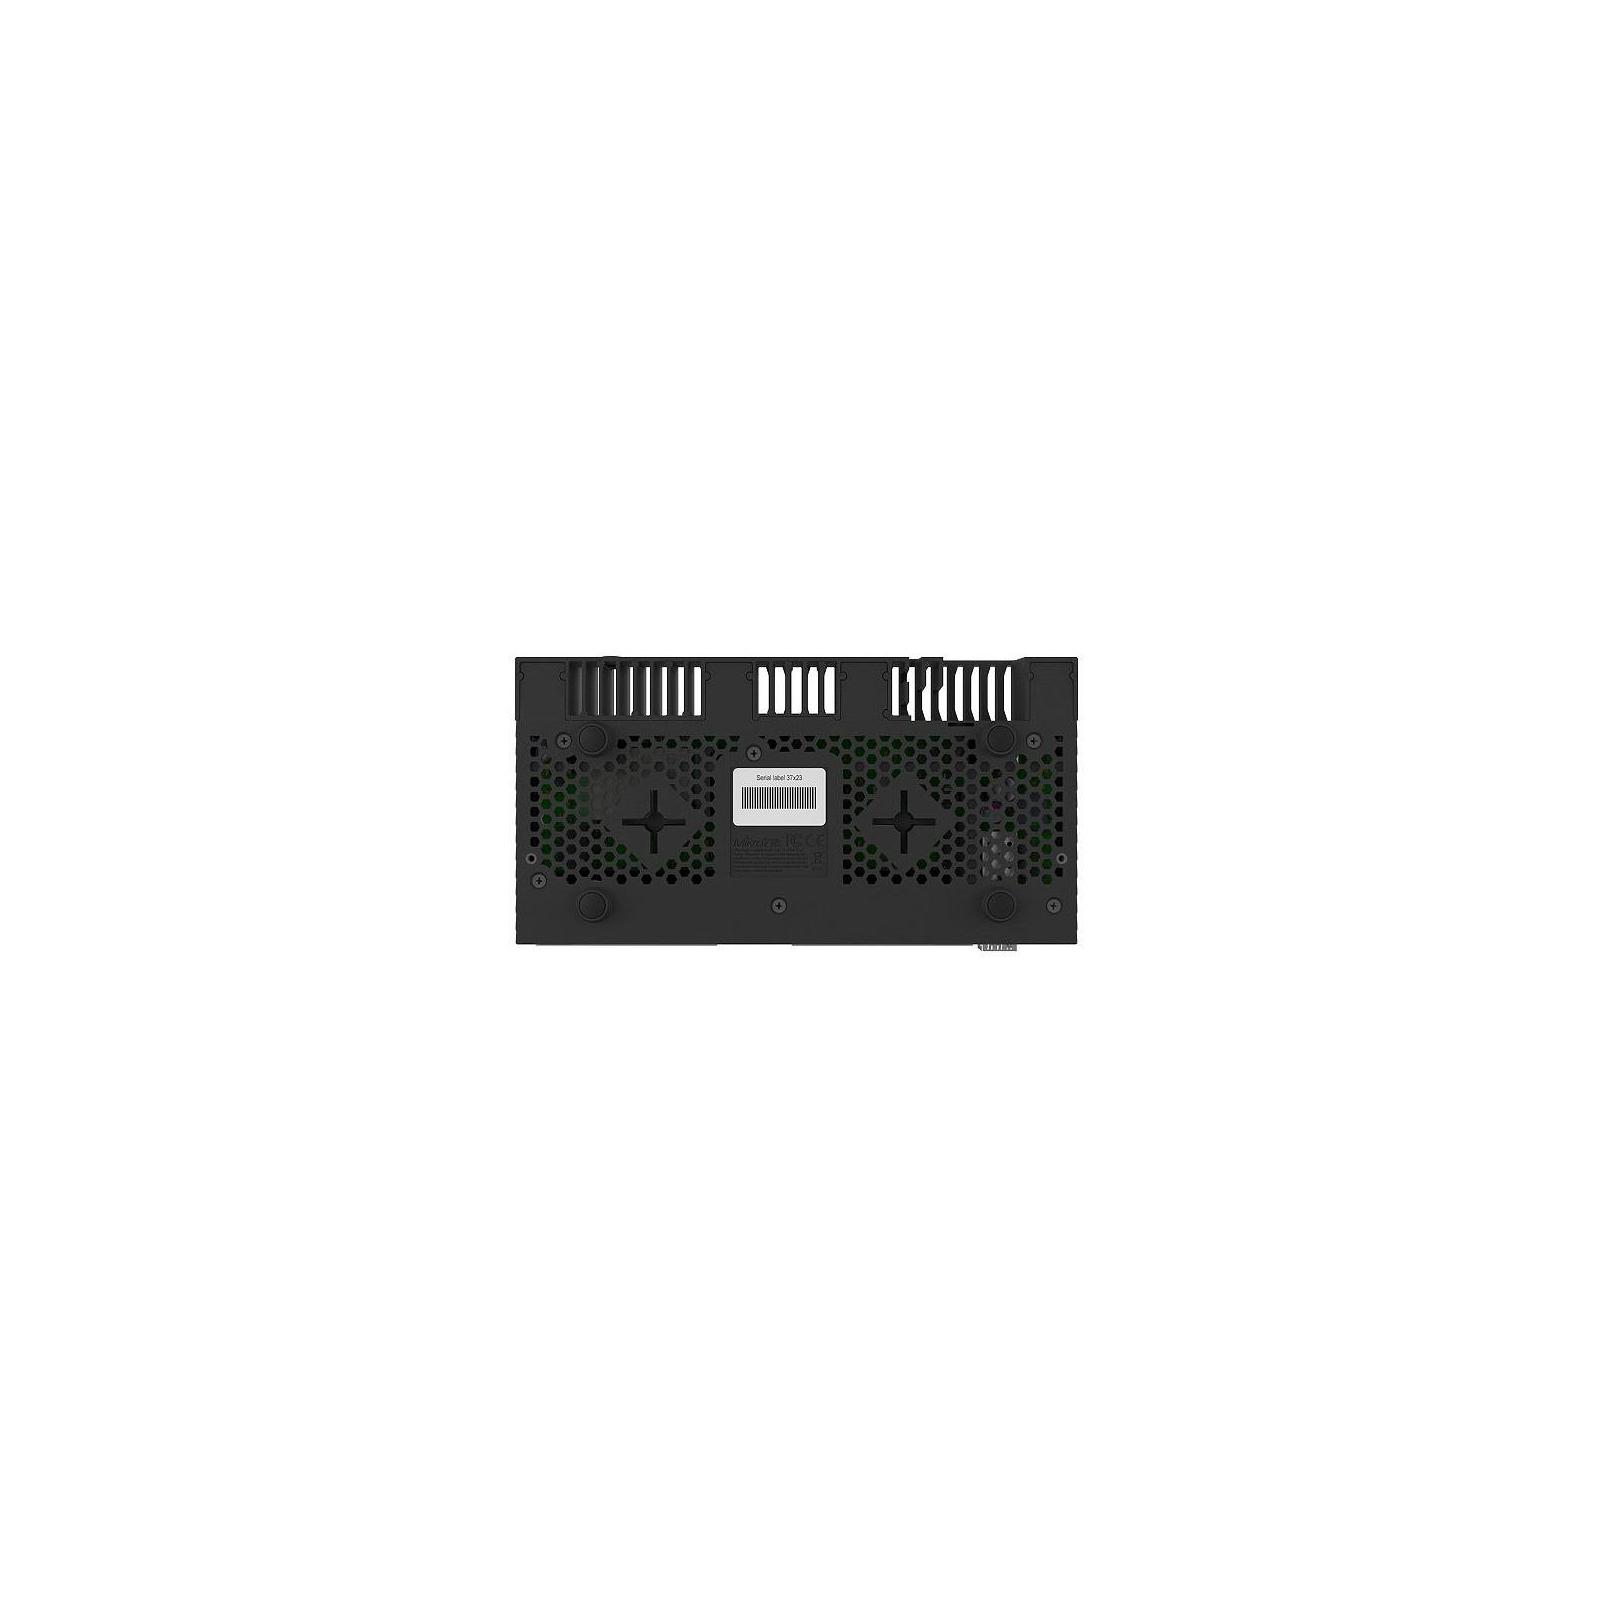 Маршрутизатор Mikrotik RB4011iGS+RM изображение 6